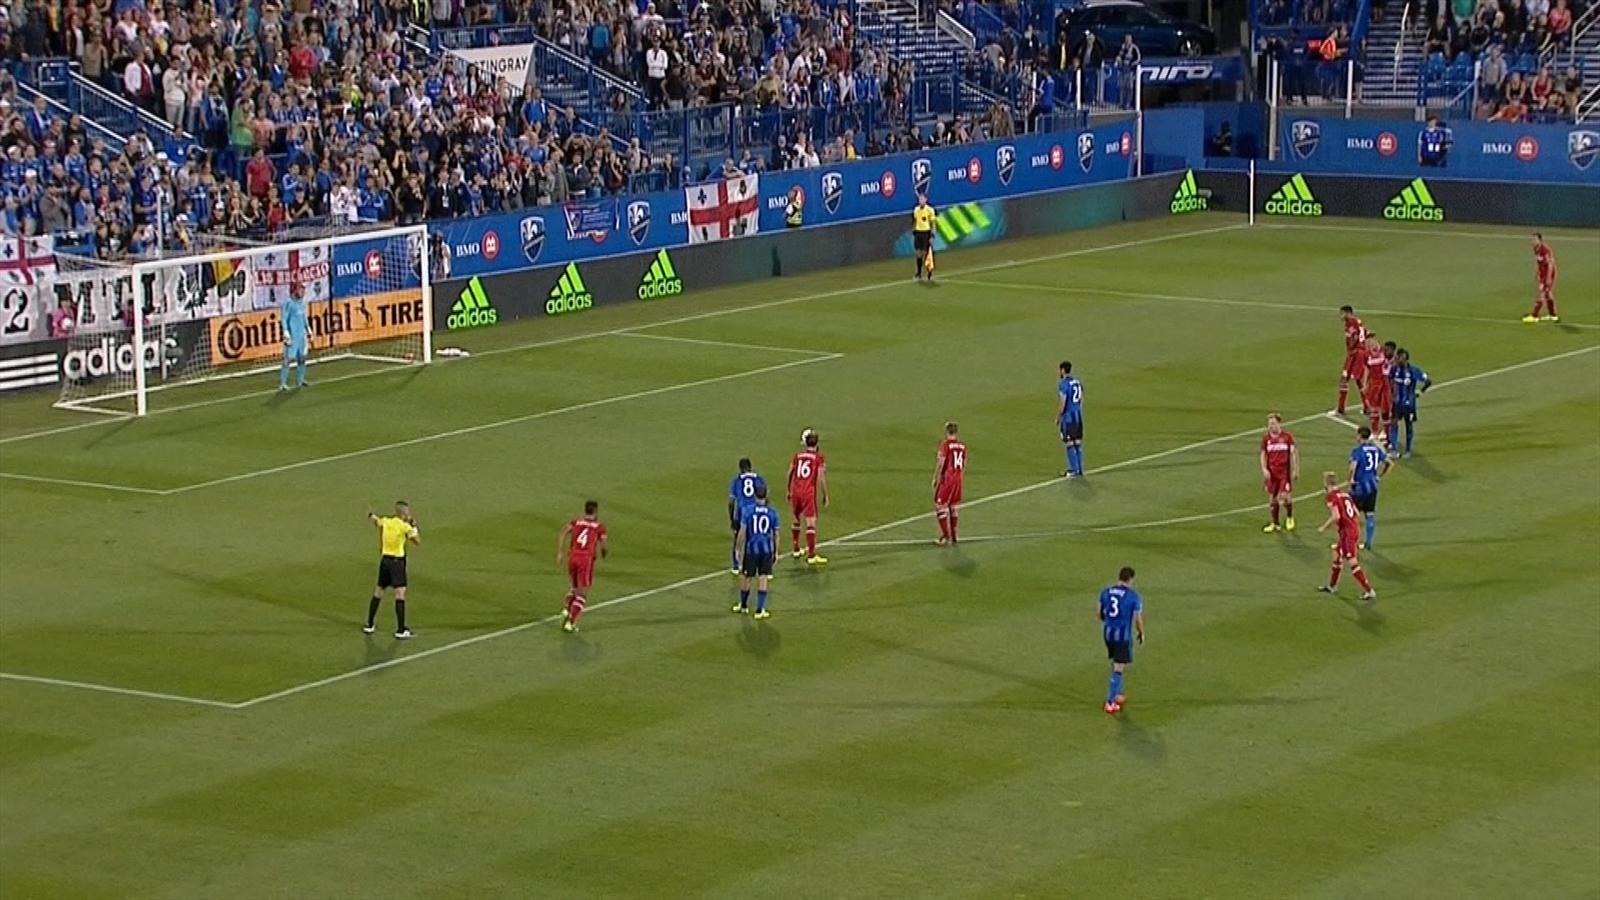 Supersport live streaming de fútbol / Earthvpn dd-wrt